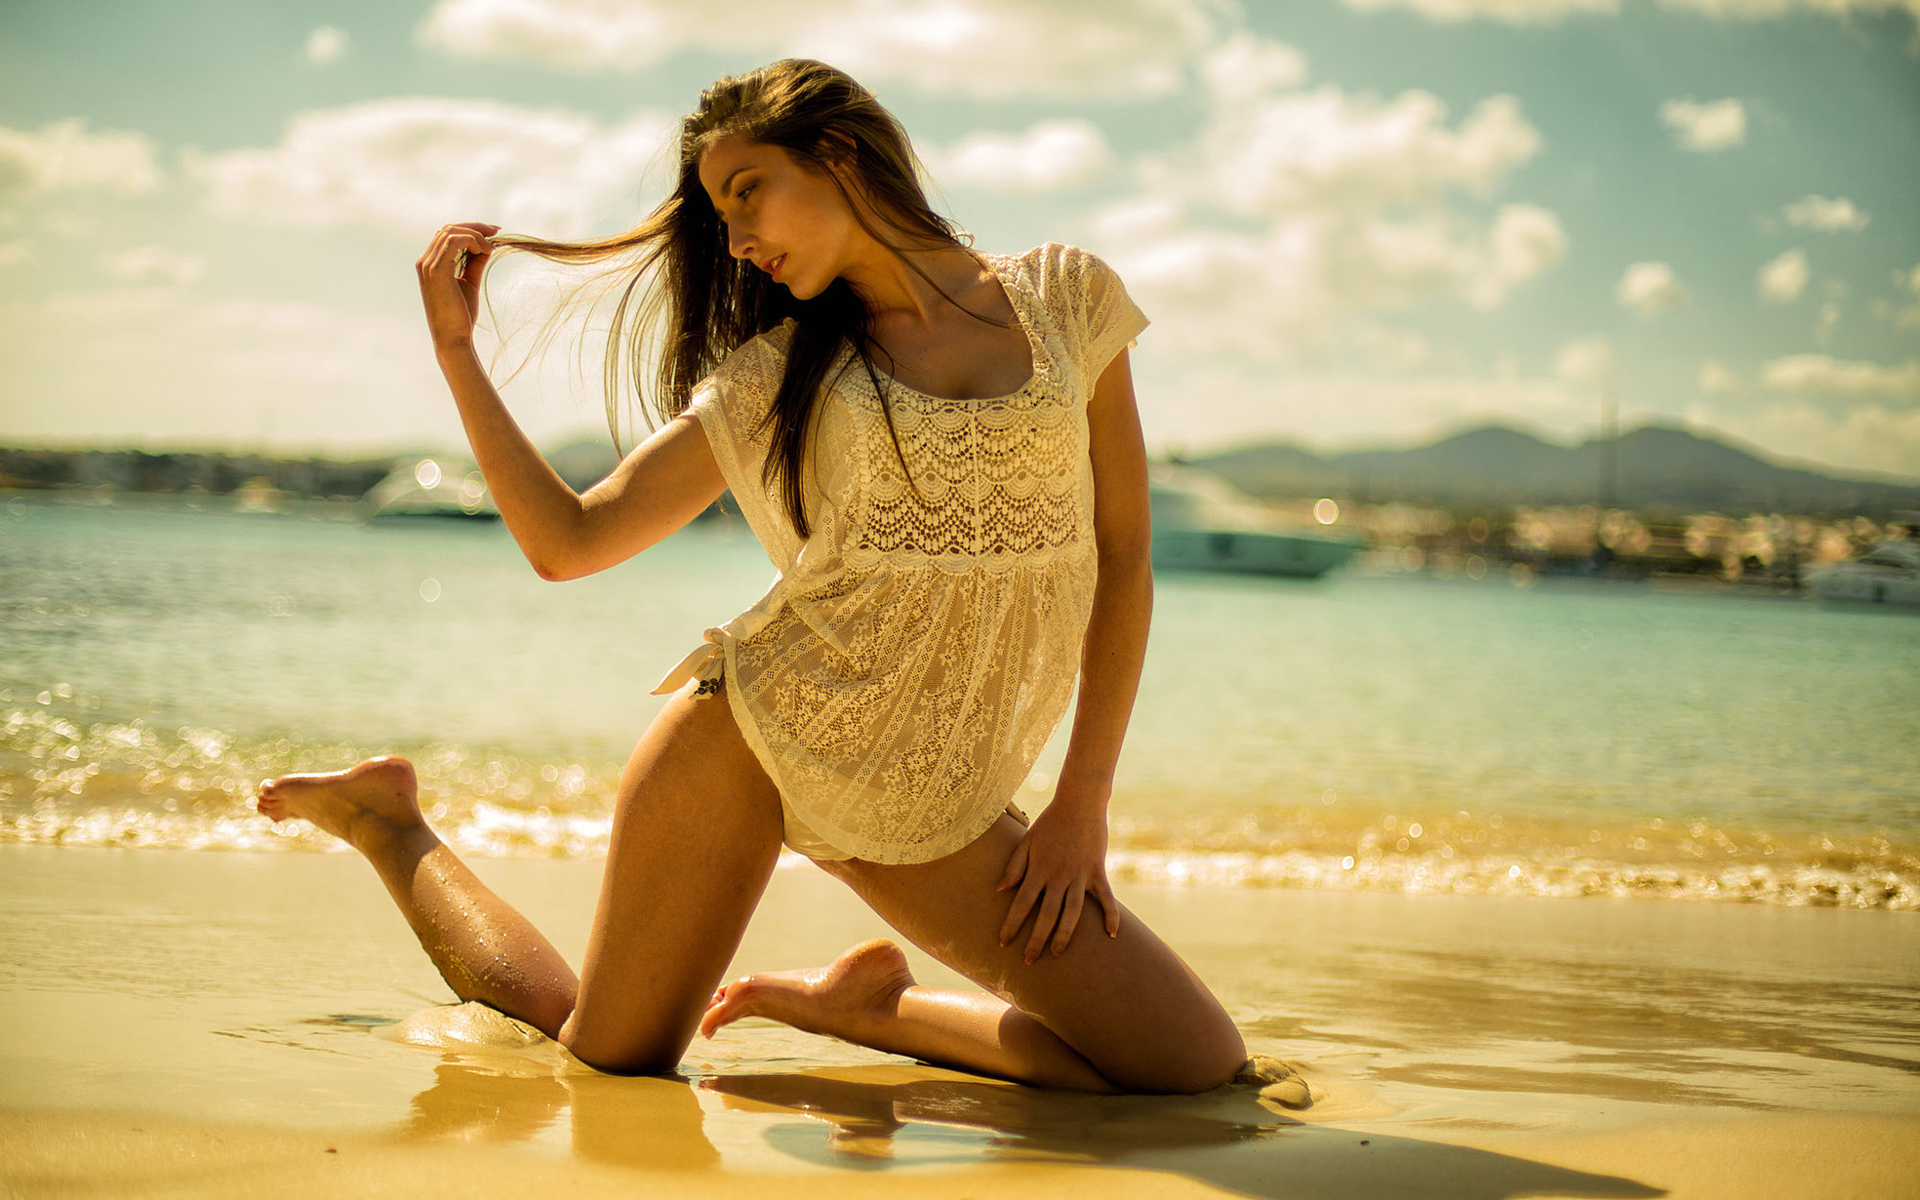 Фото девушек на фоне океана, Фото: Девушка на фоне океана 16 фотография